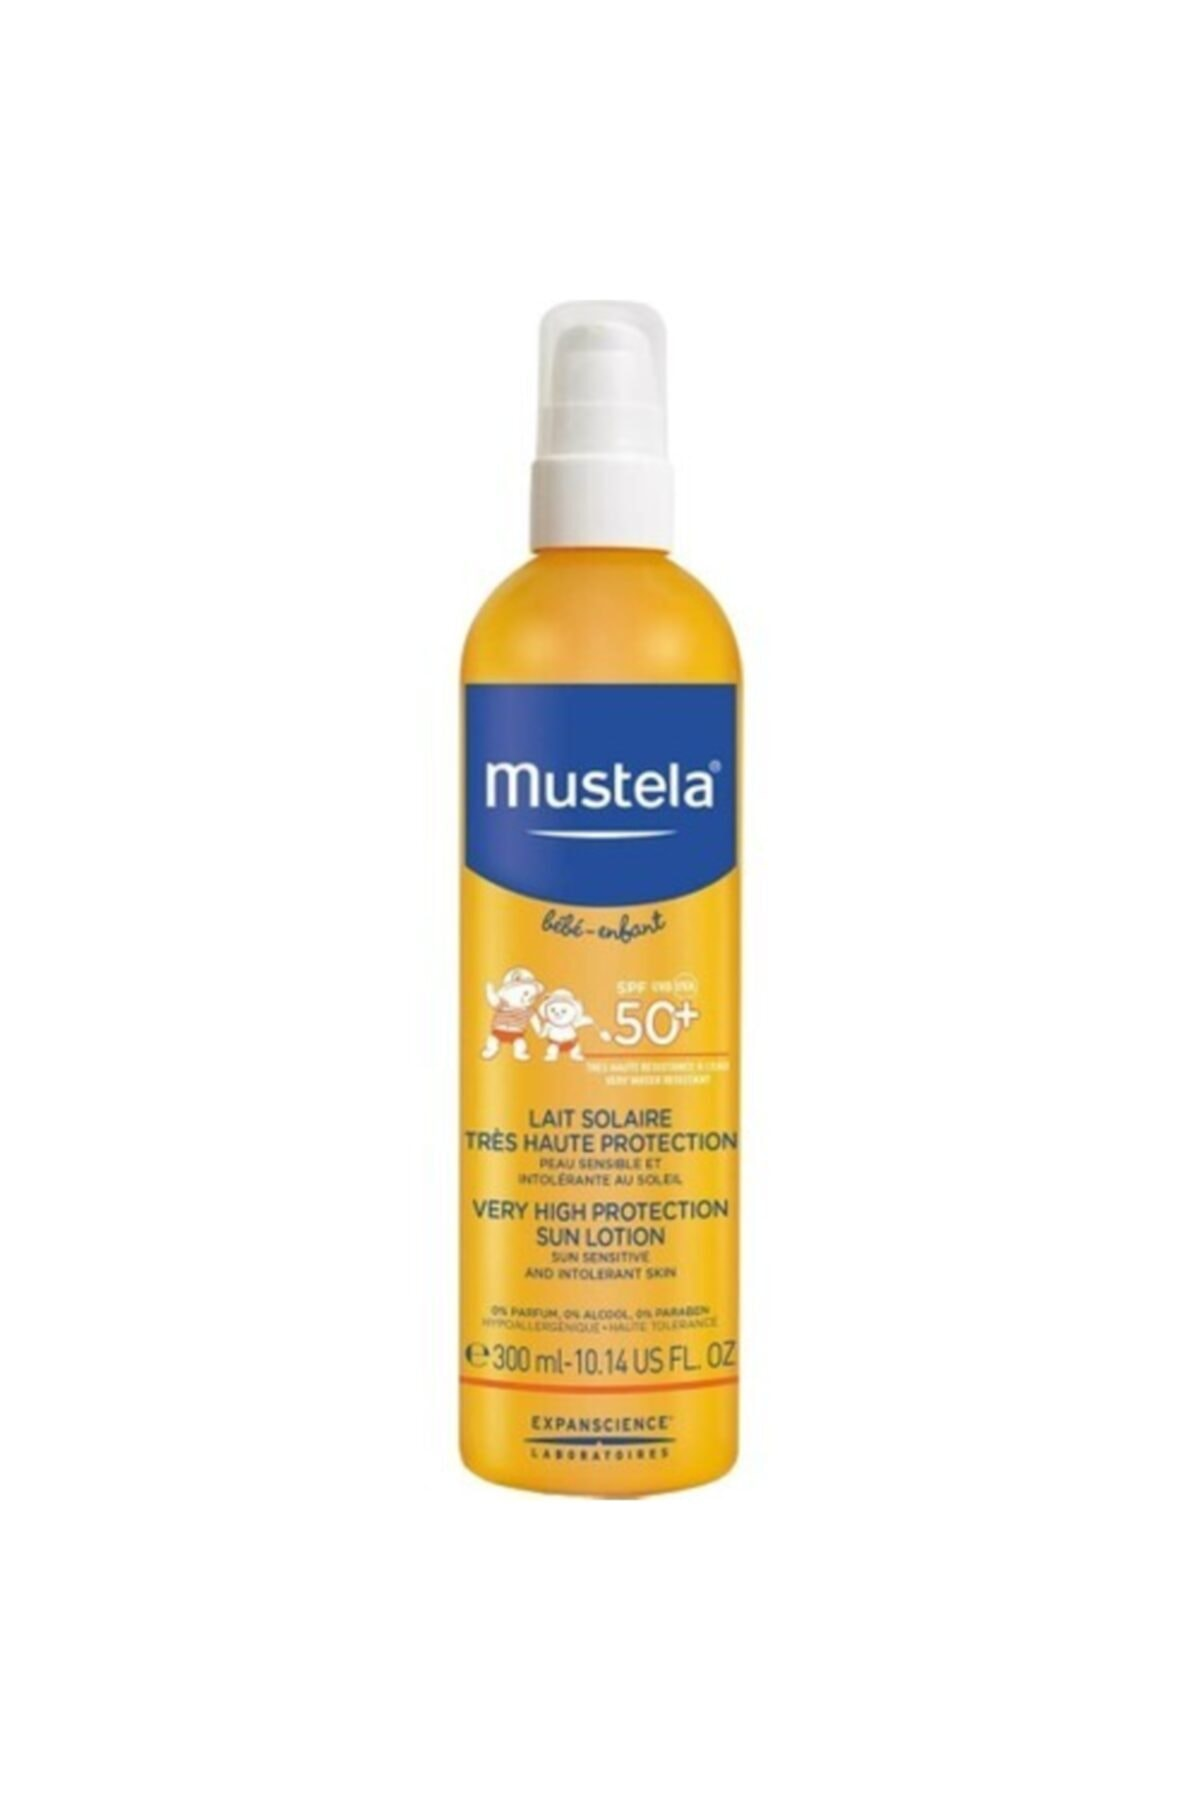 Mustela Very High Protection Sun Lotion Güneş Kremi Spf50+ 300 Ml 1